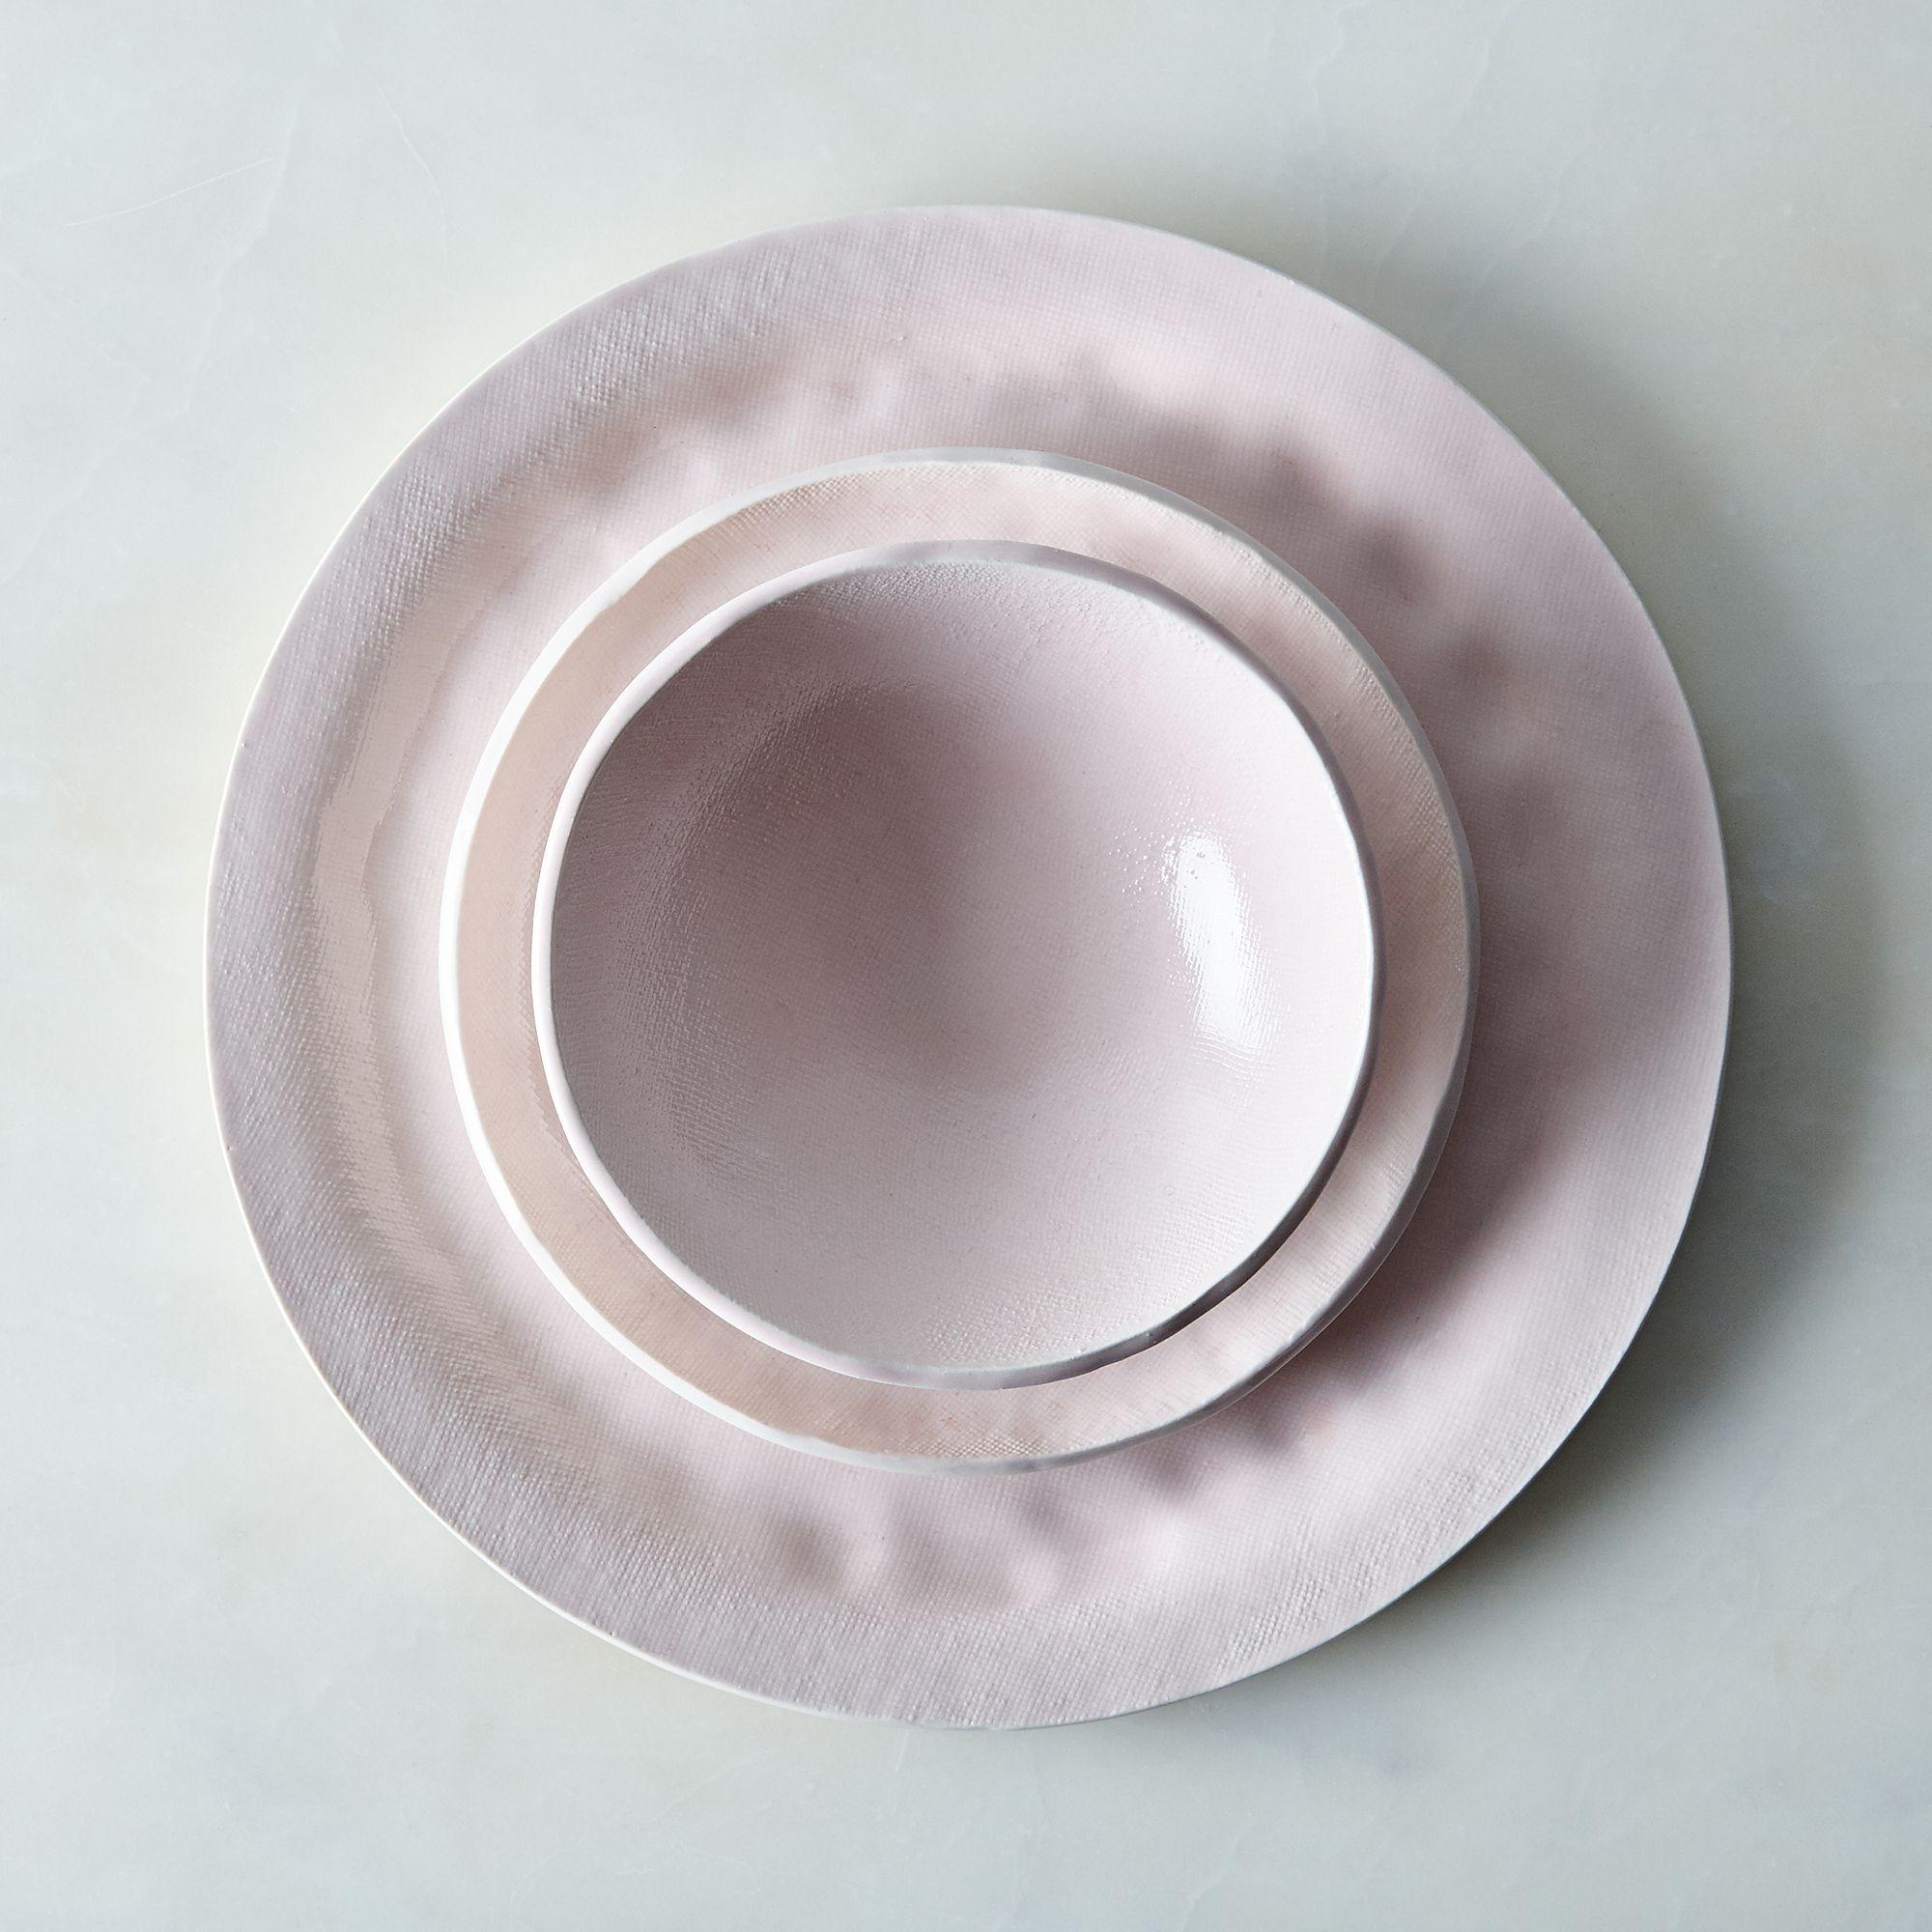 Casual Porcelain Dinnerware Sets